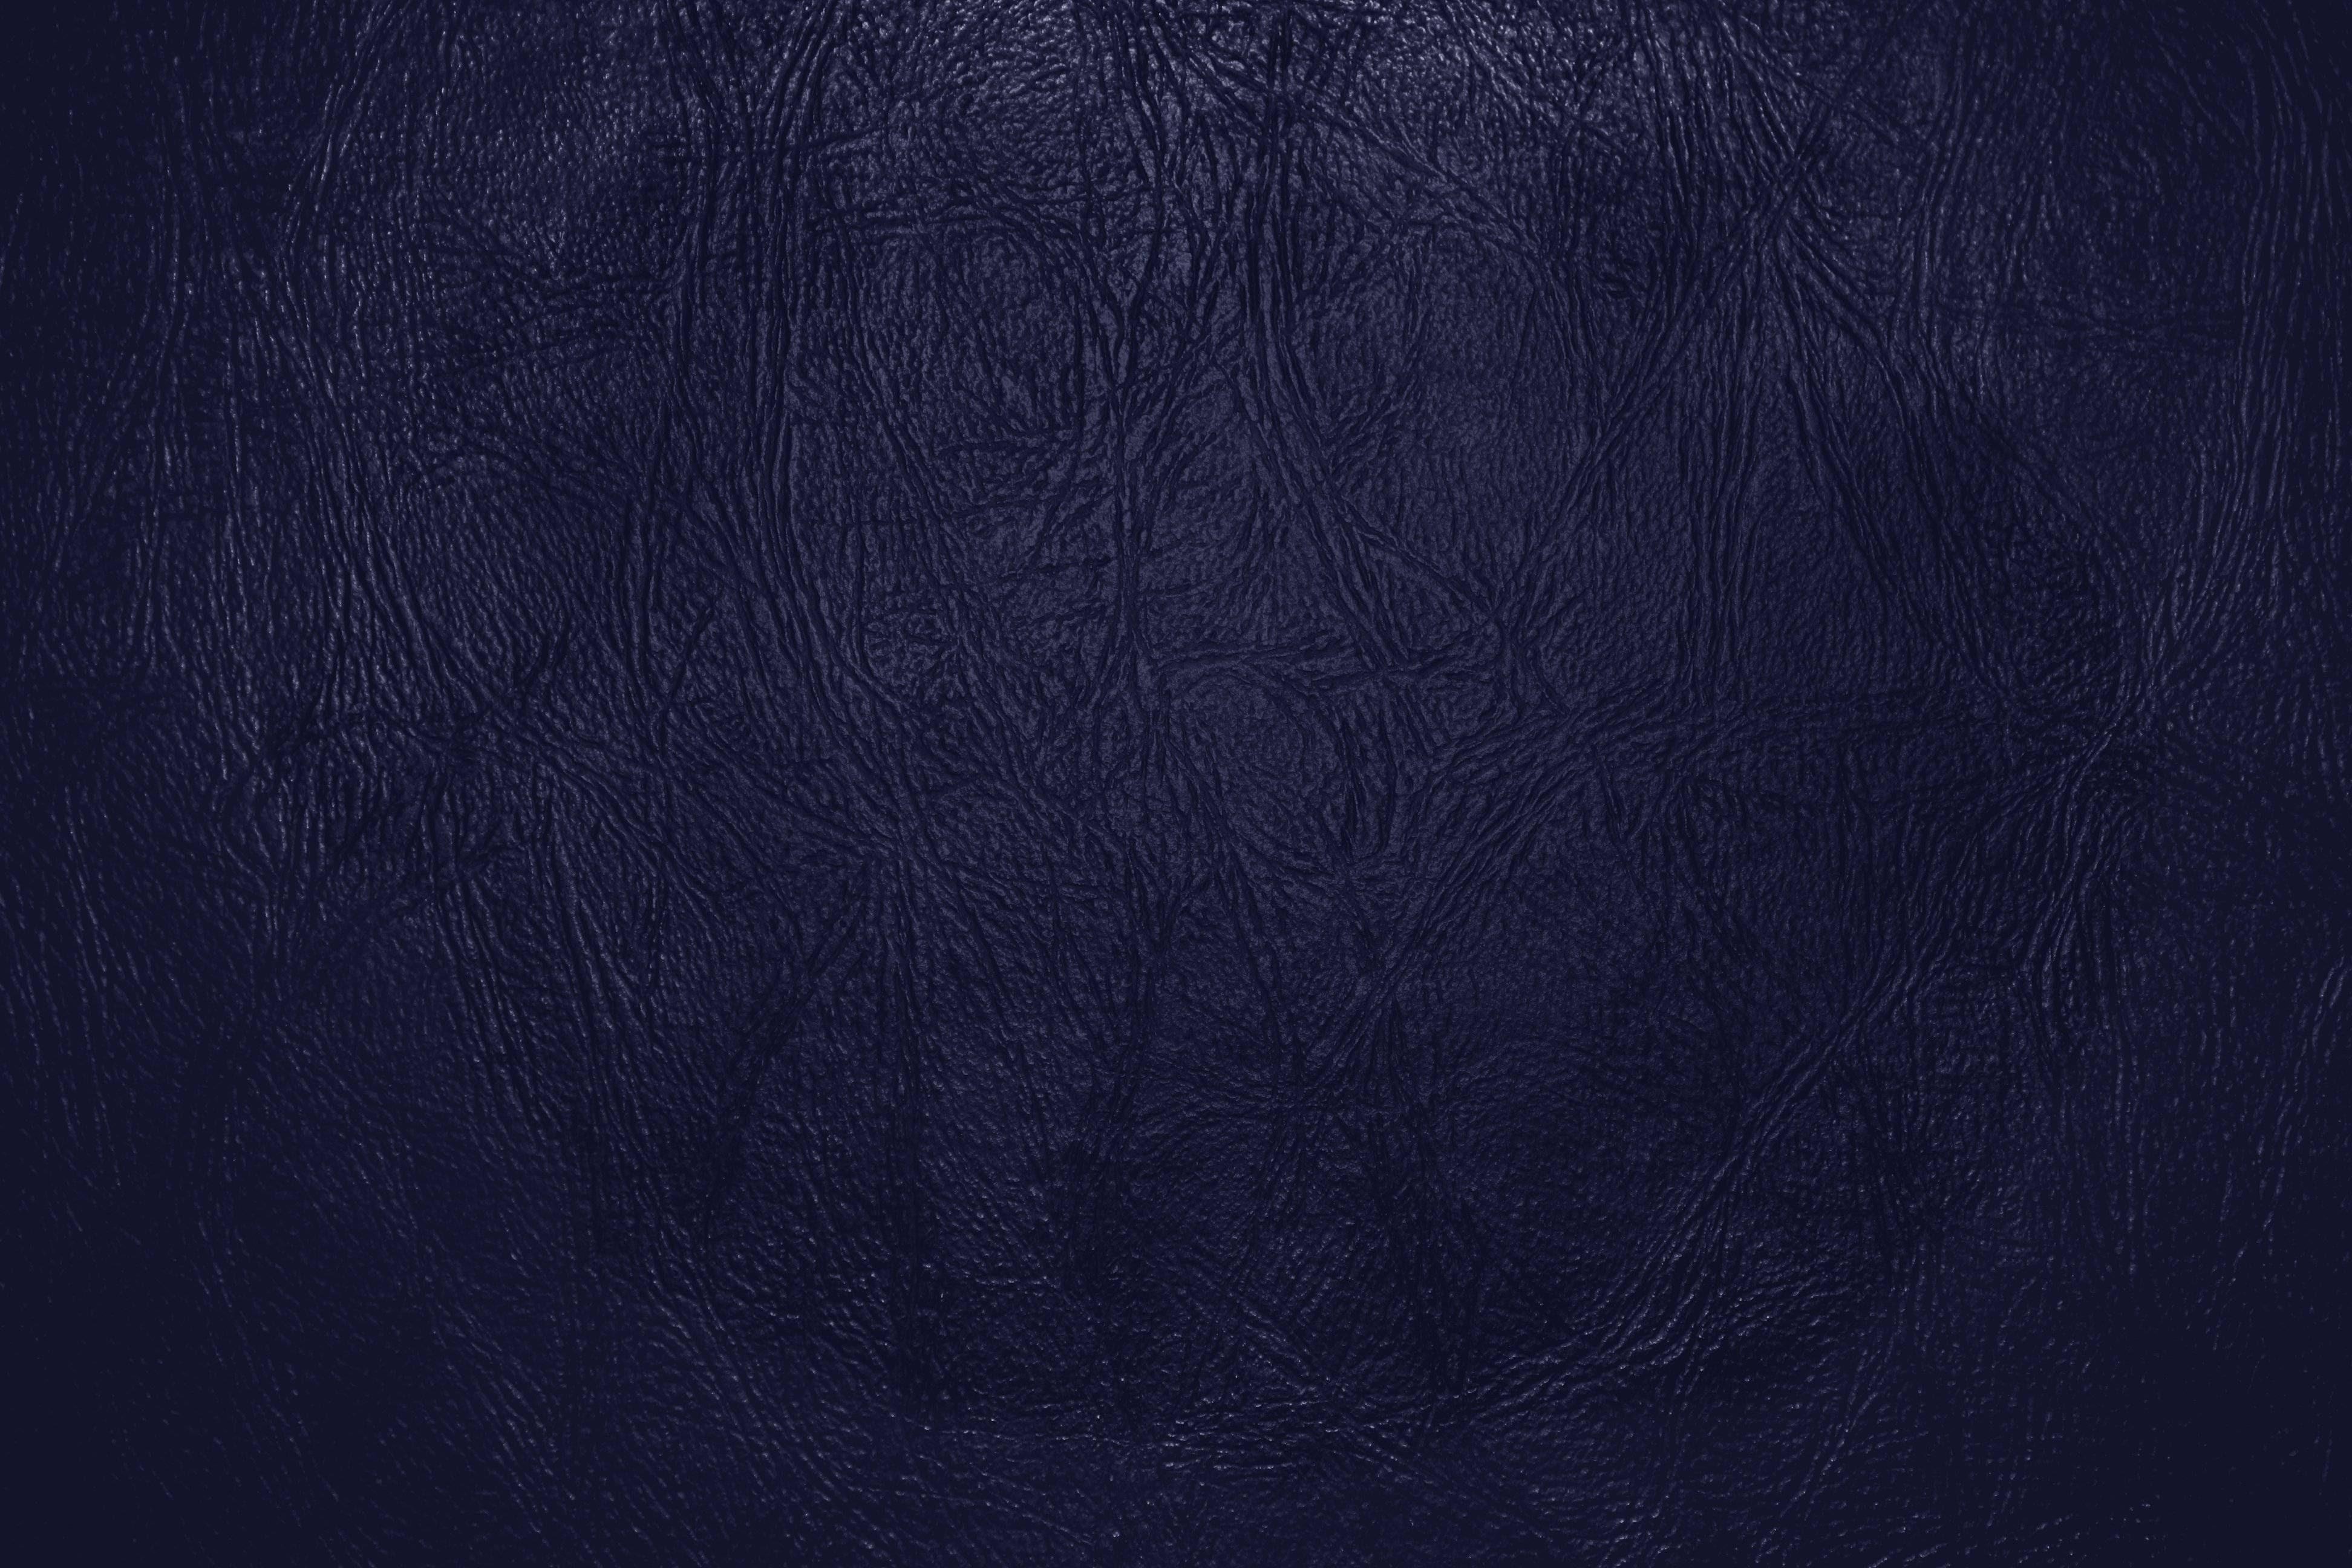 Unduh 5200 Koleksi Background Warna Biru Navy HD Paling